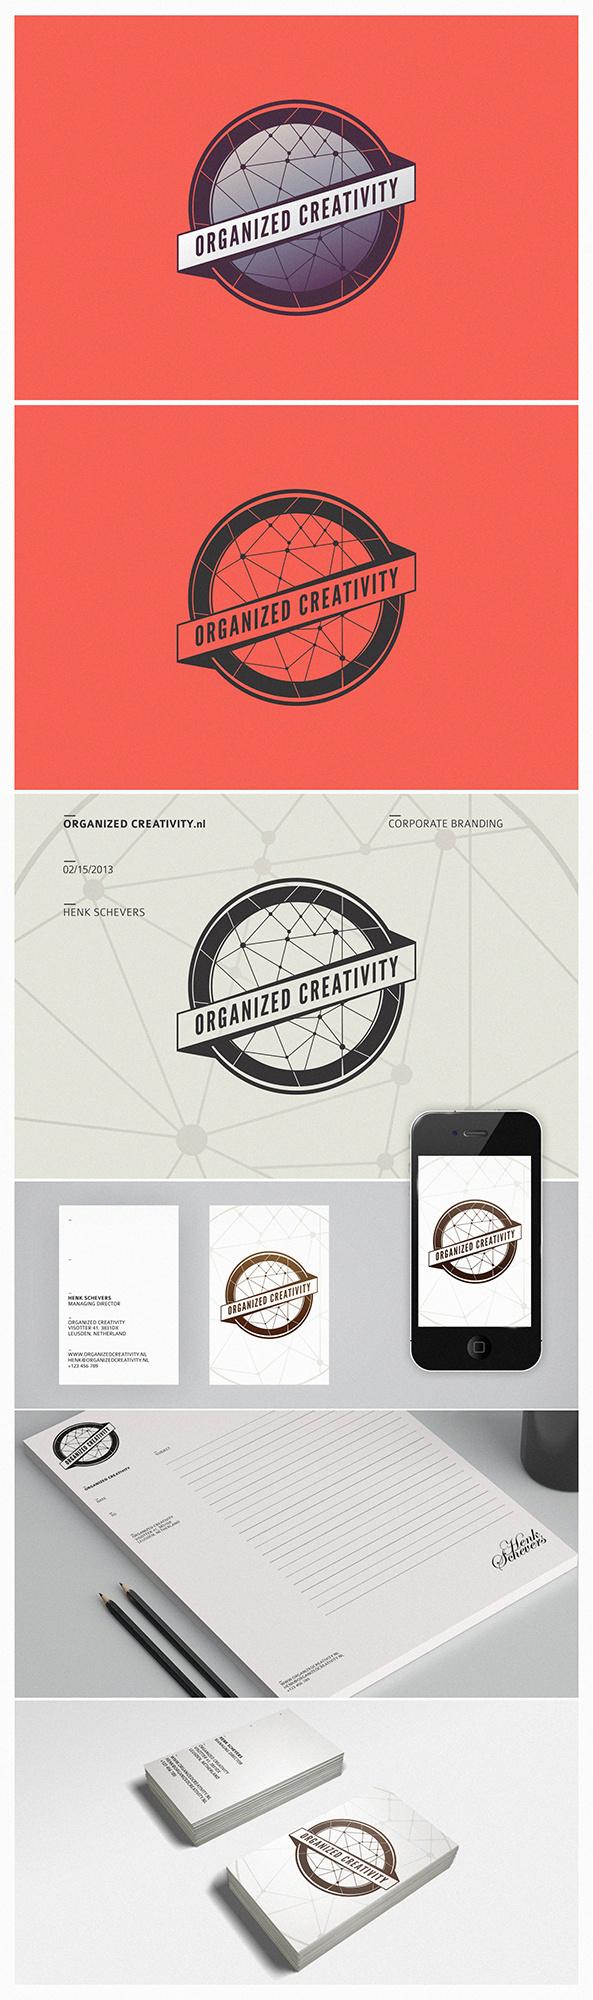 Organized Creativity Corporate Branding - Netherland #business #branding #minimalize #card #design #simple #logo #trend